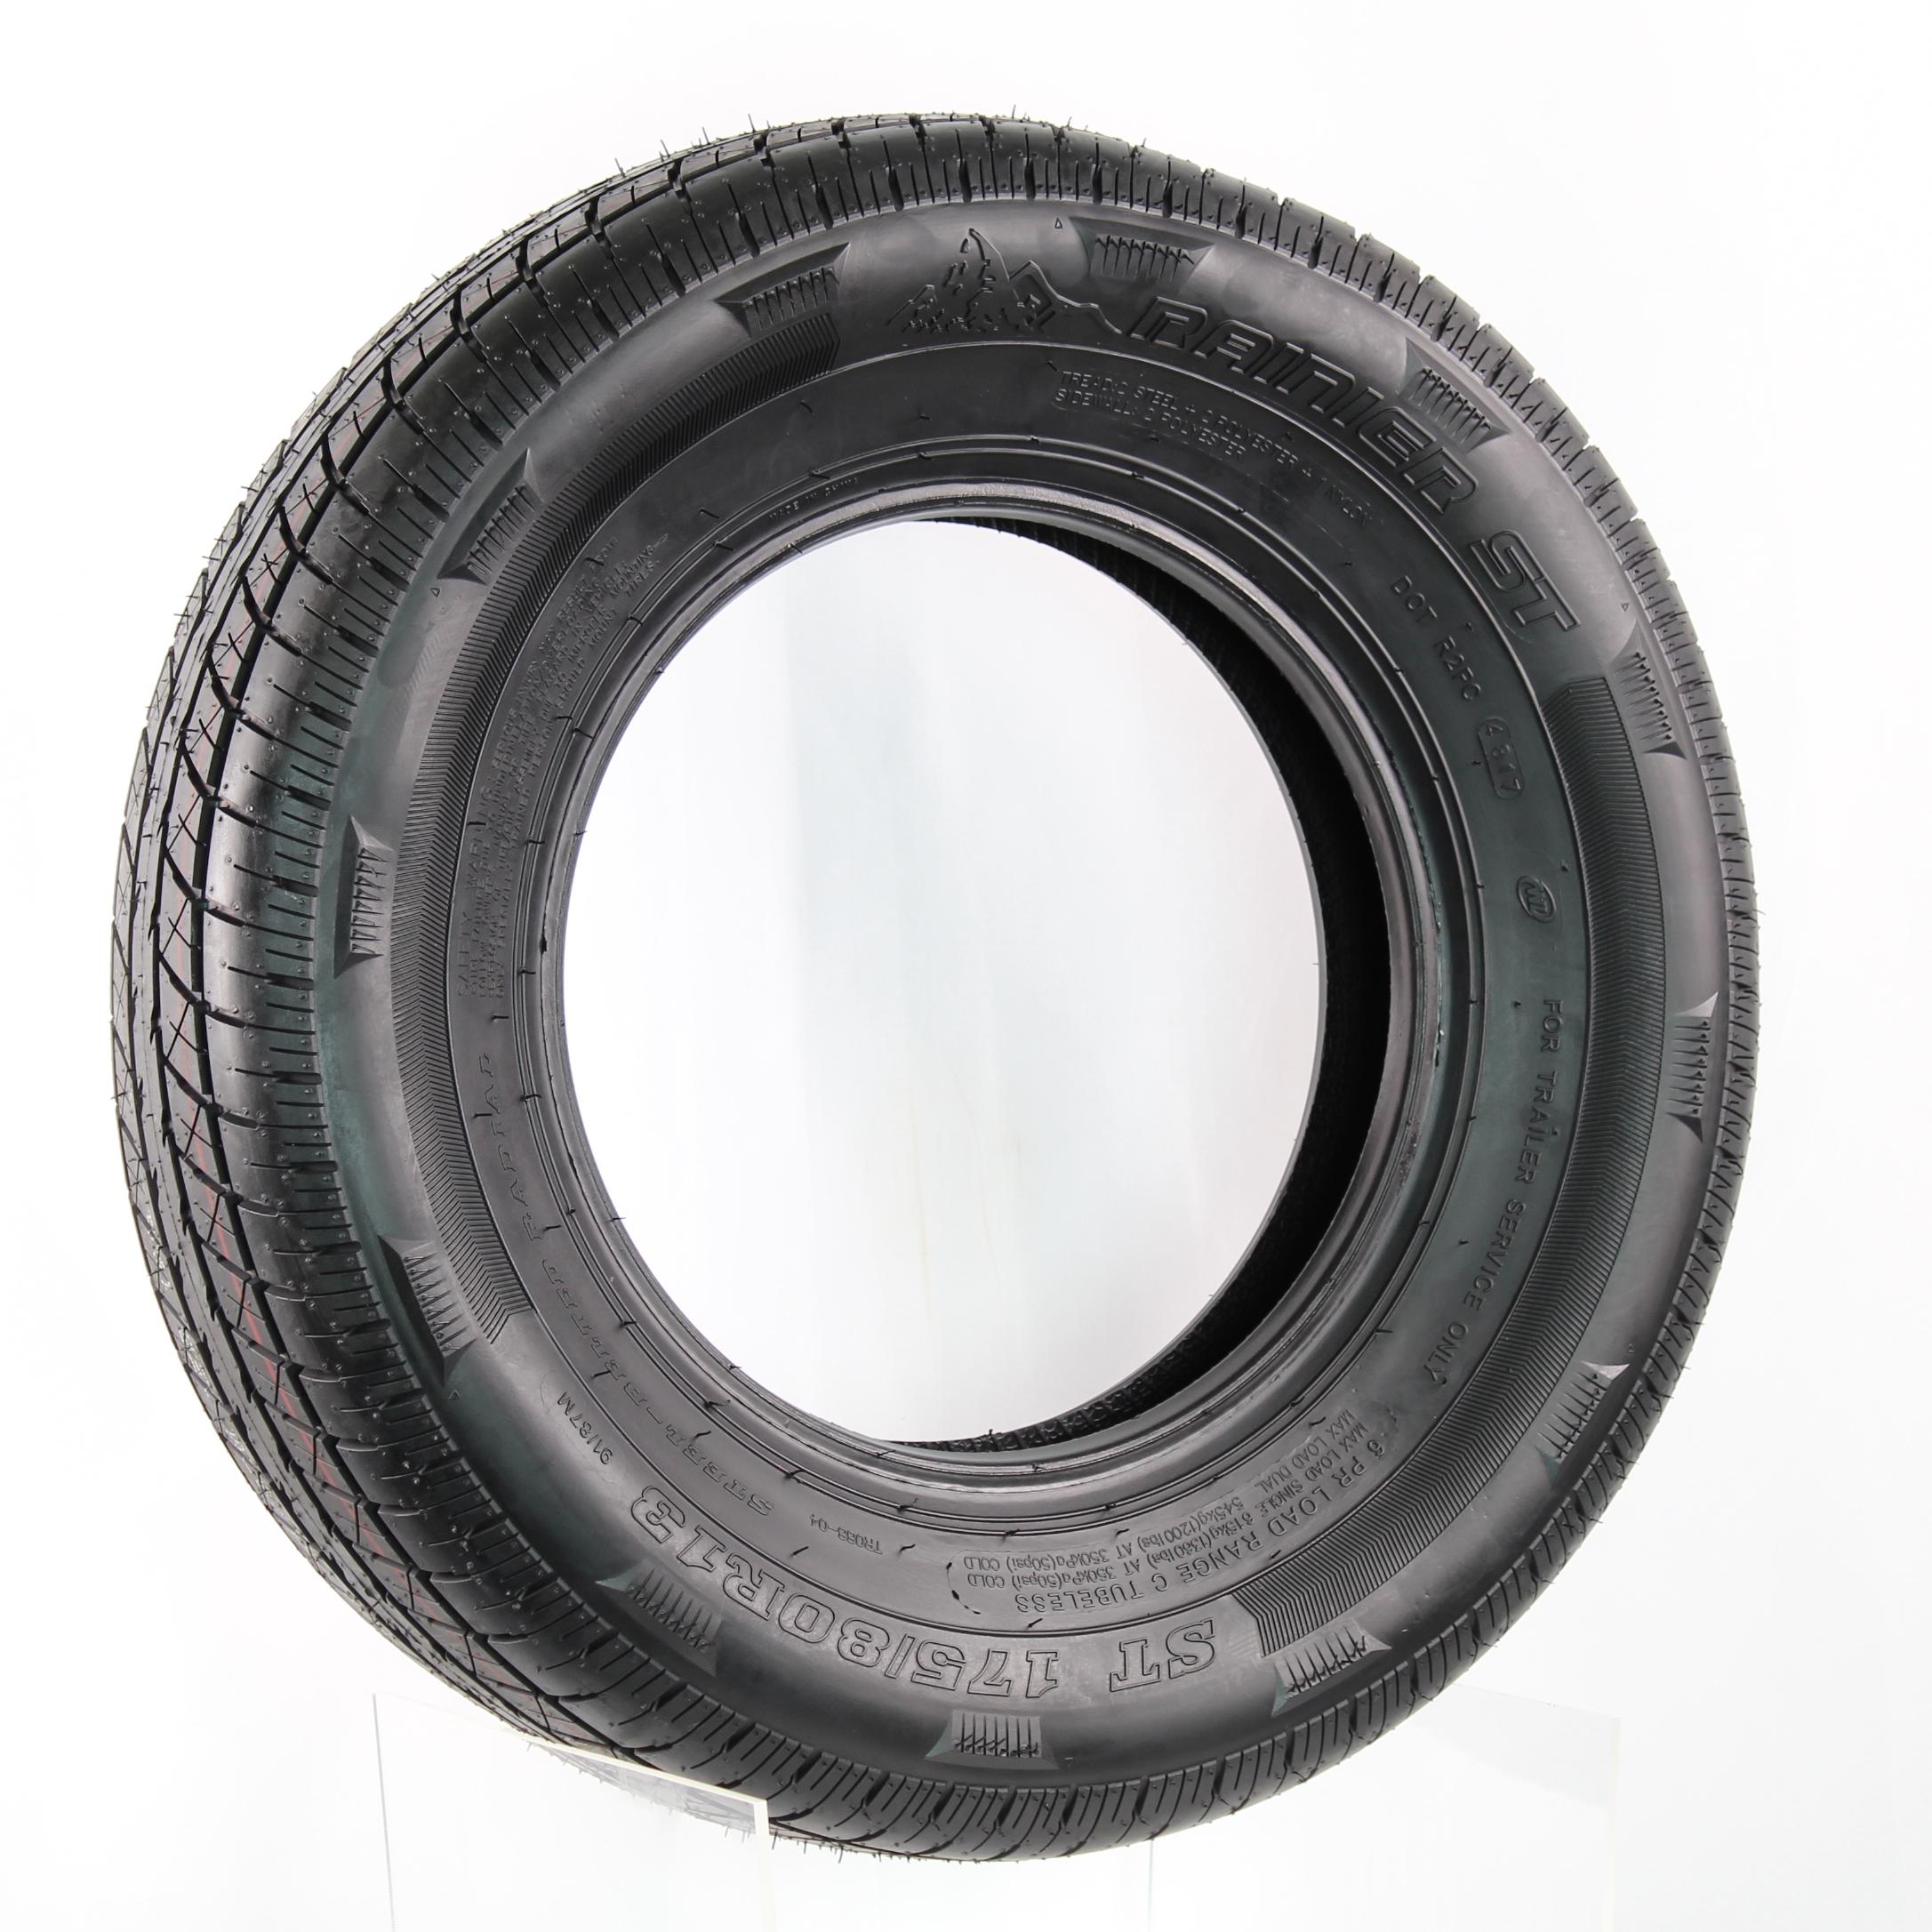 Rainier ST175/80R13 LRC 6-Ply Radial Trailer Tire Image